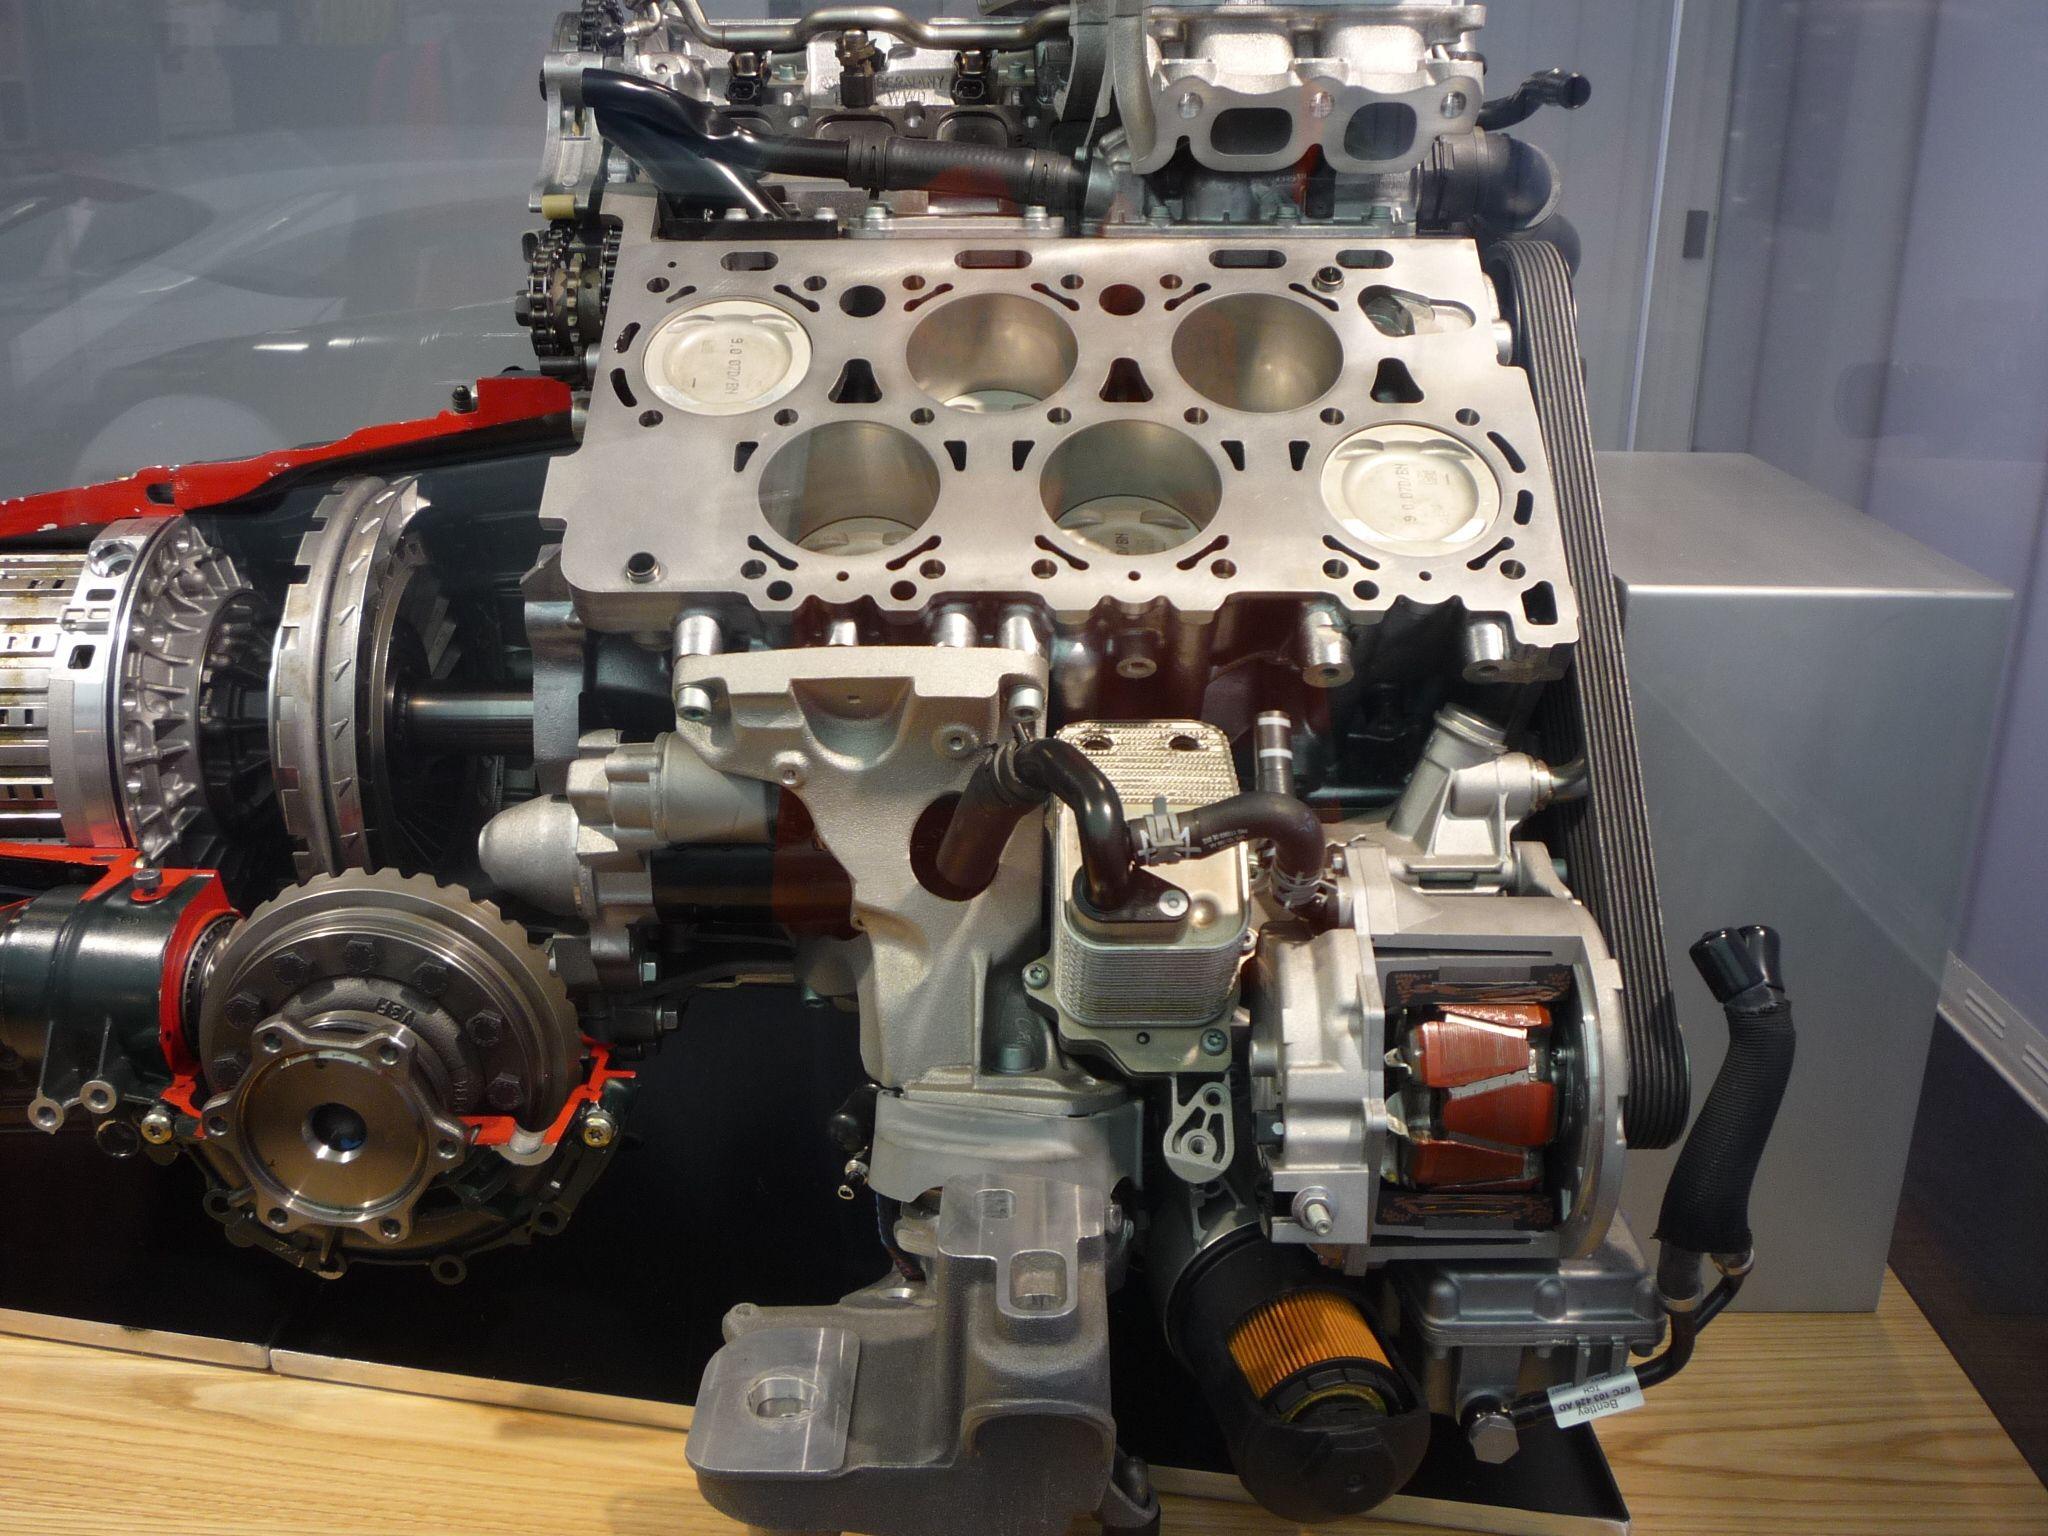 Bentley W12 | Car Engines | W12 engine, Engineering, Truck